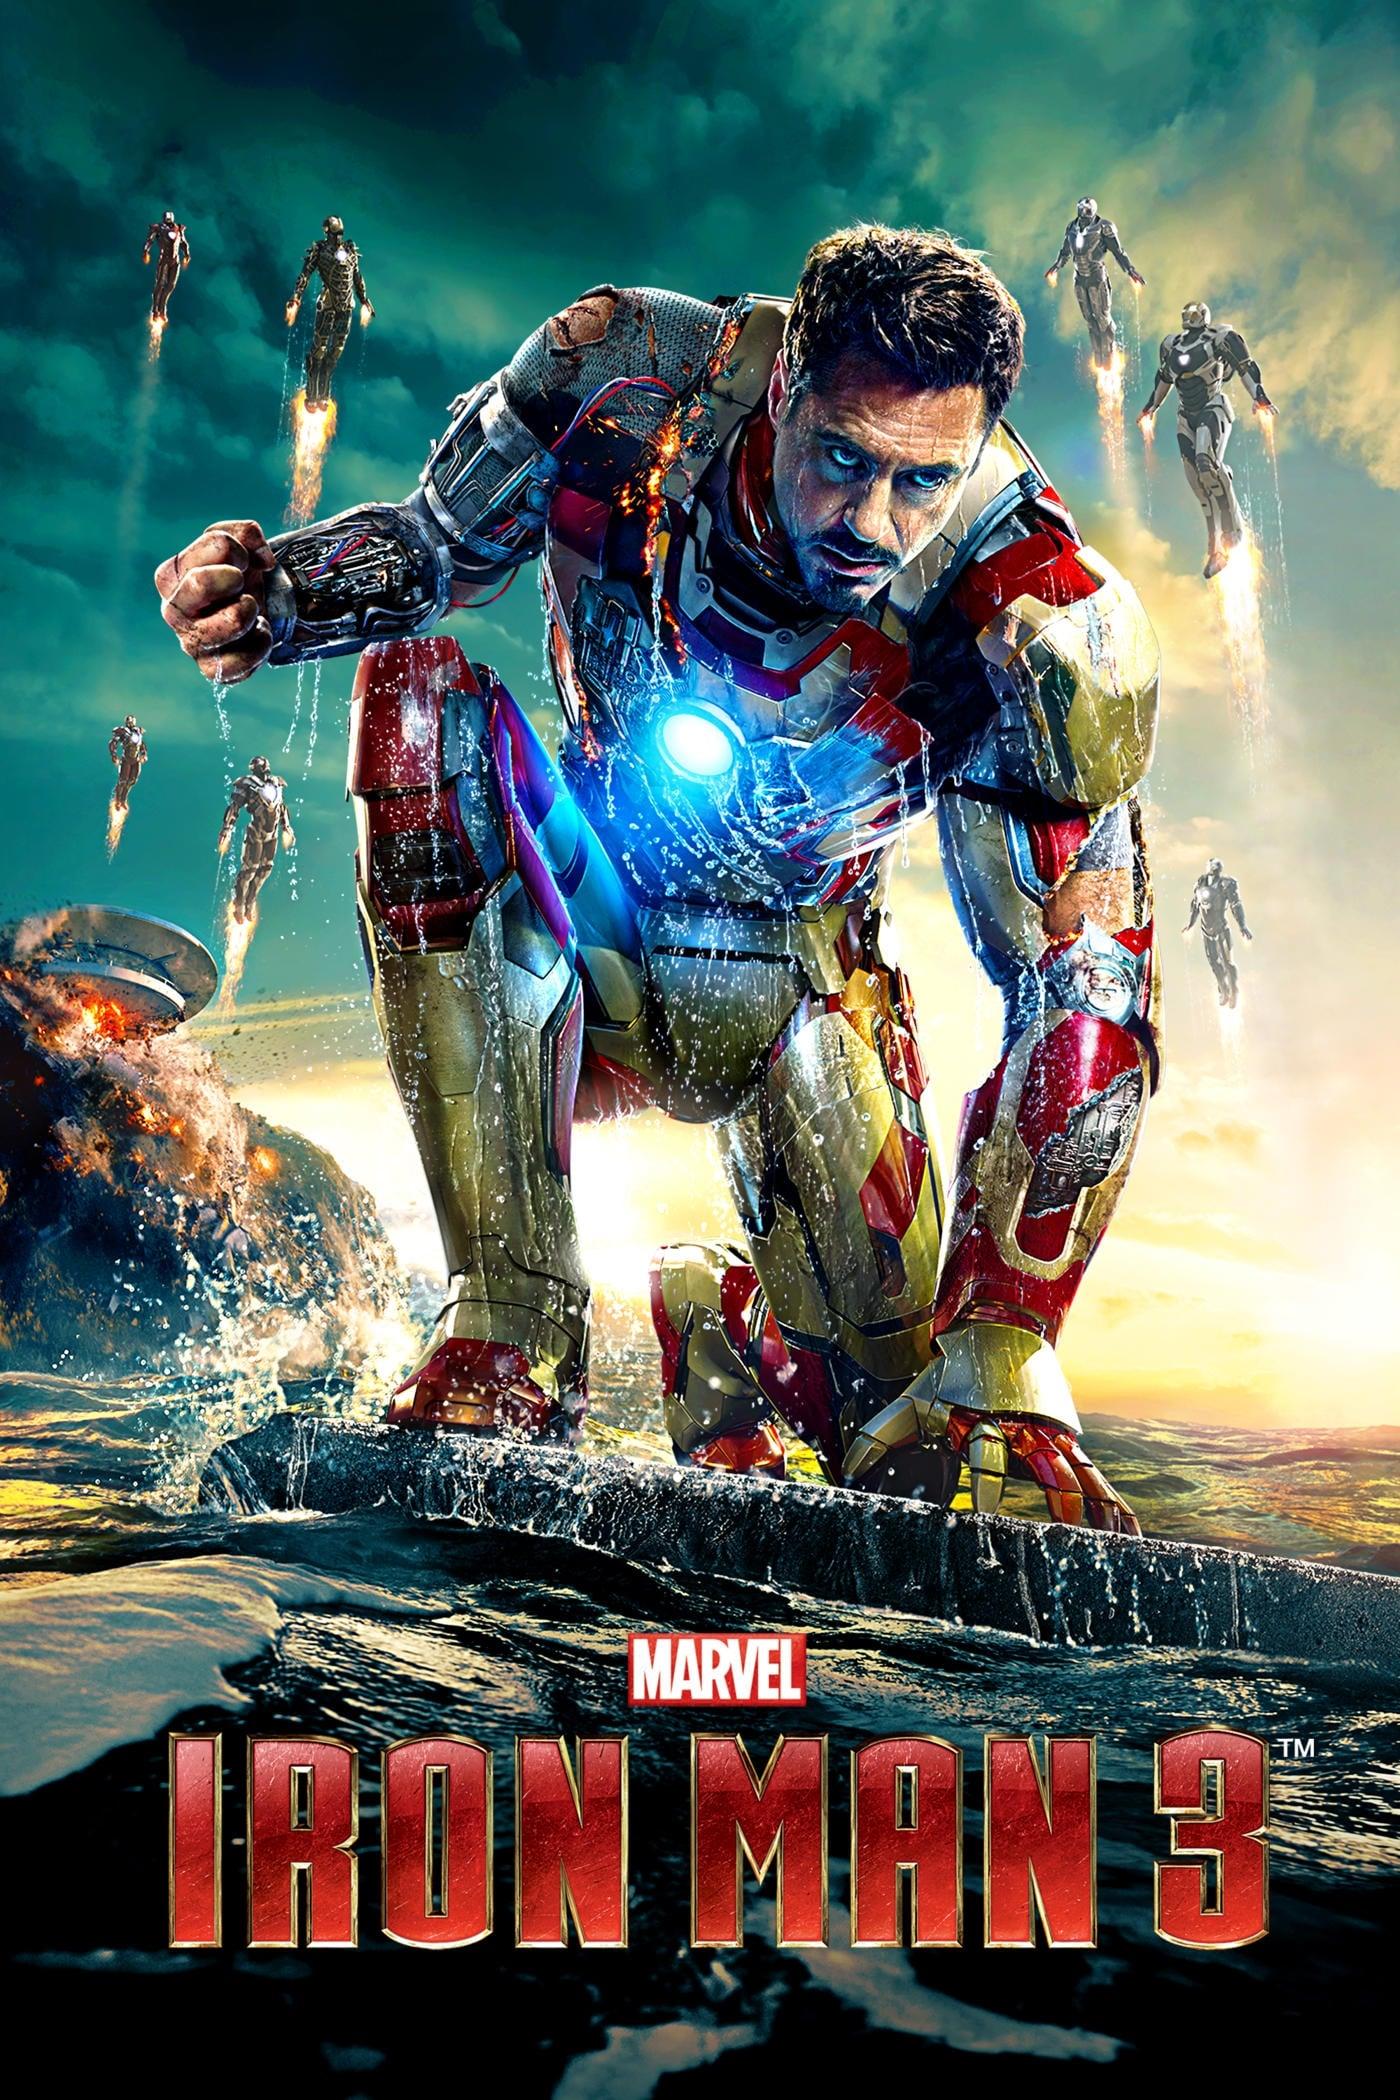 Iron Man 3 (2013) HD 720P LATINO/INGLES